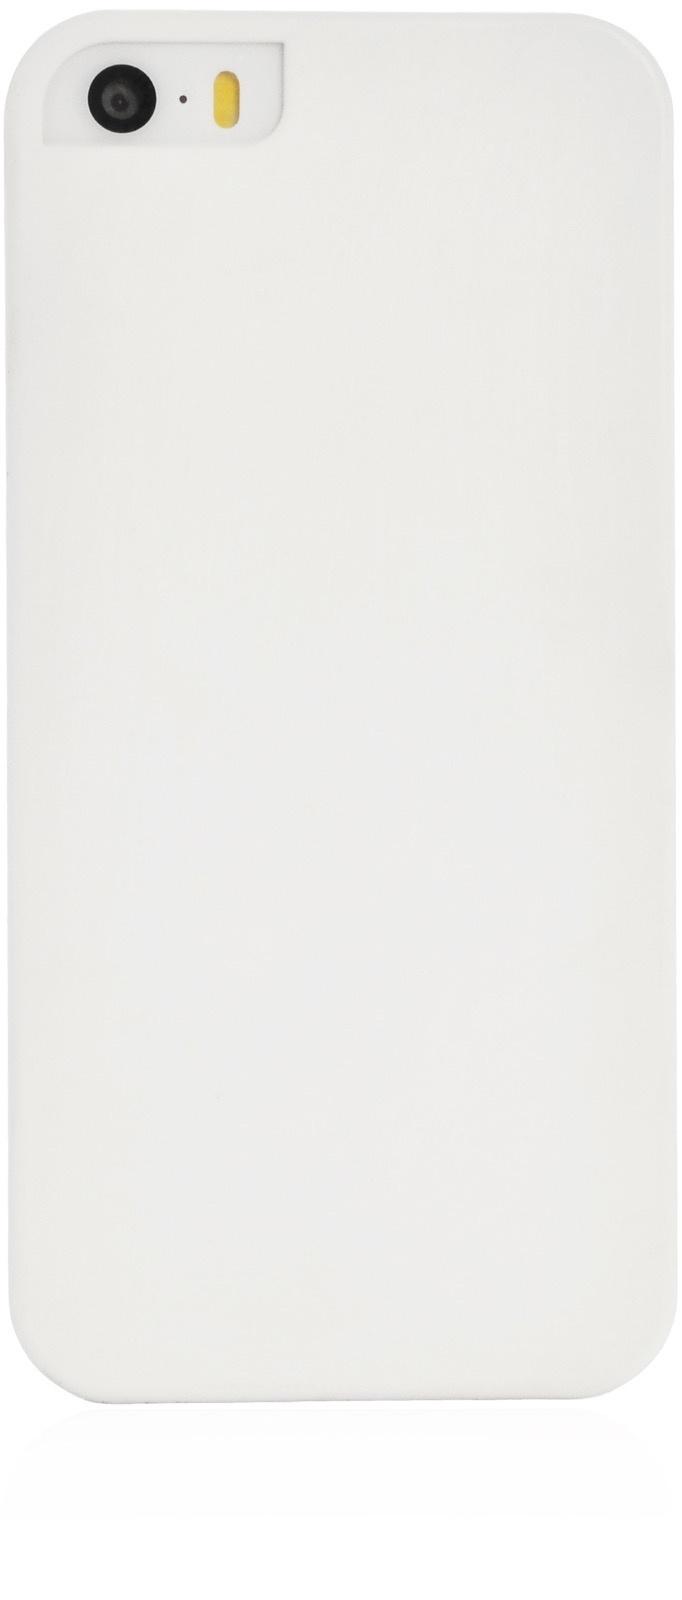 Чехол iNeez soft touch накладка пластик c вырезом лепесток для Apple iPhone 5/5S/SE,906314,белый